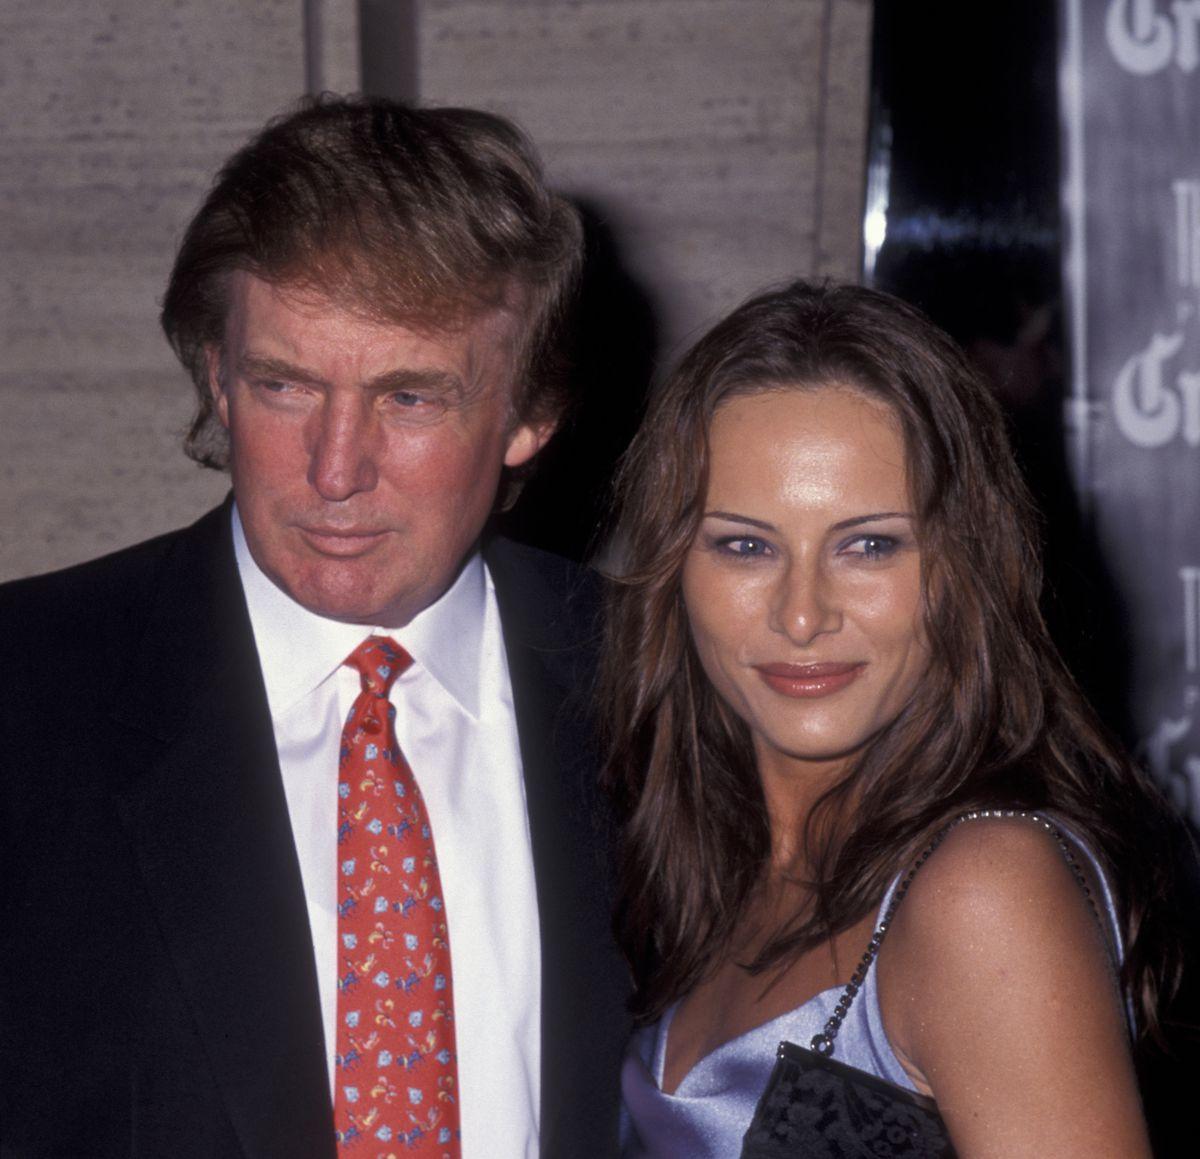 Donald and Melania Trump in 1998.